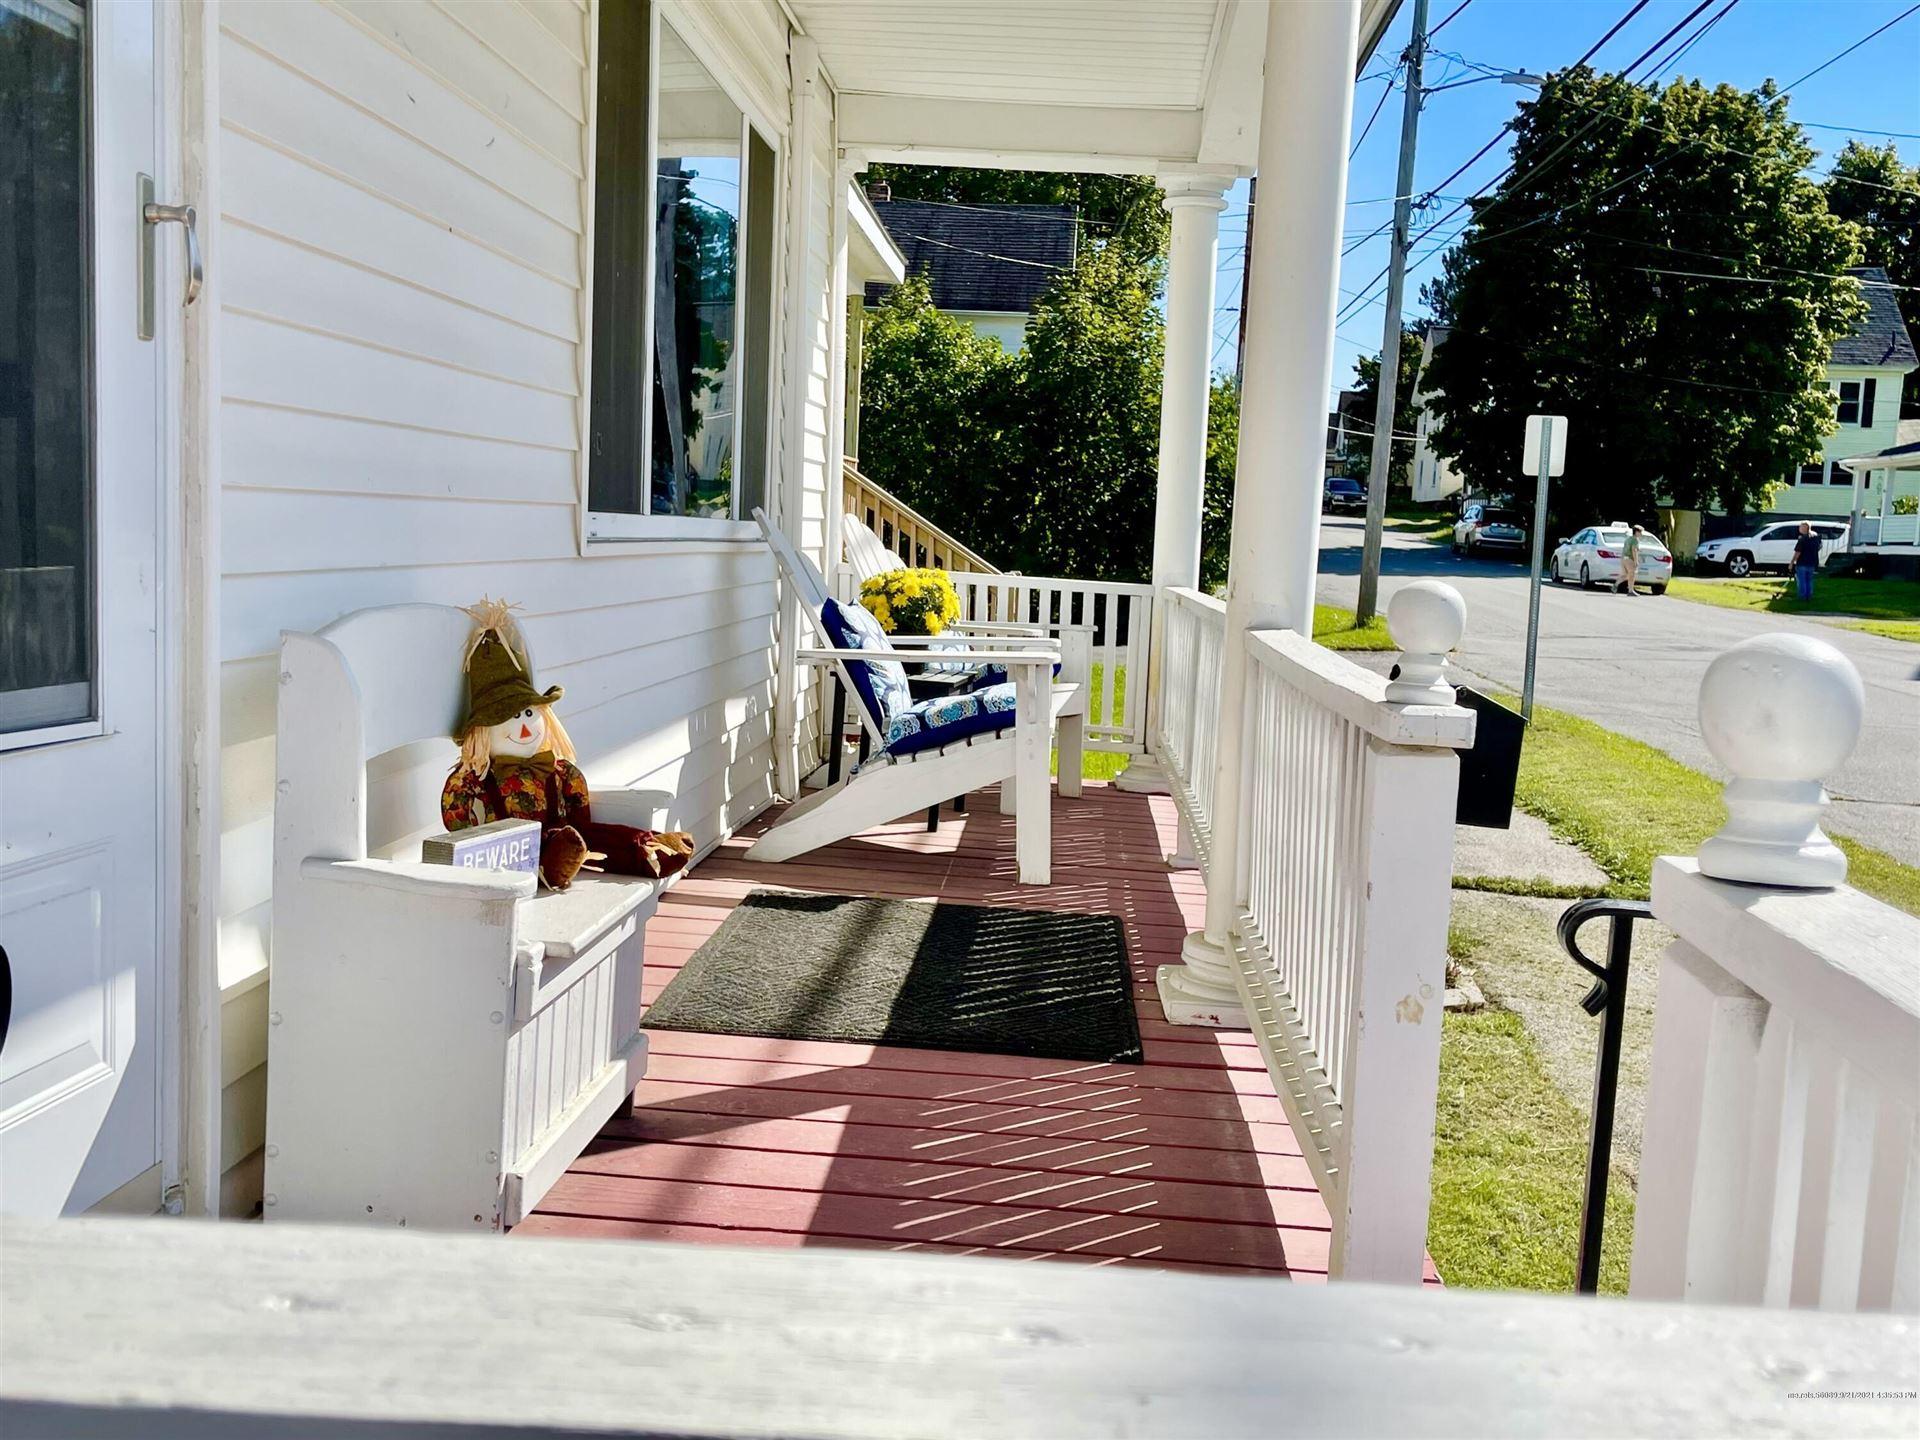 Photo of 199 Parkview Avenue, Bangor, ME 04401 (MLS # 1509675)